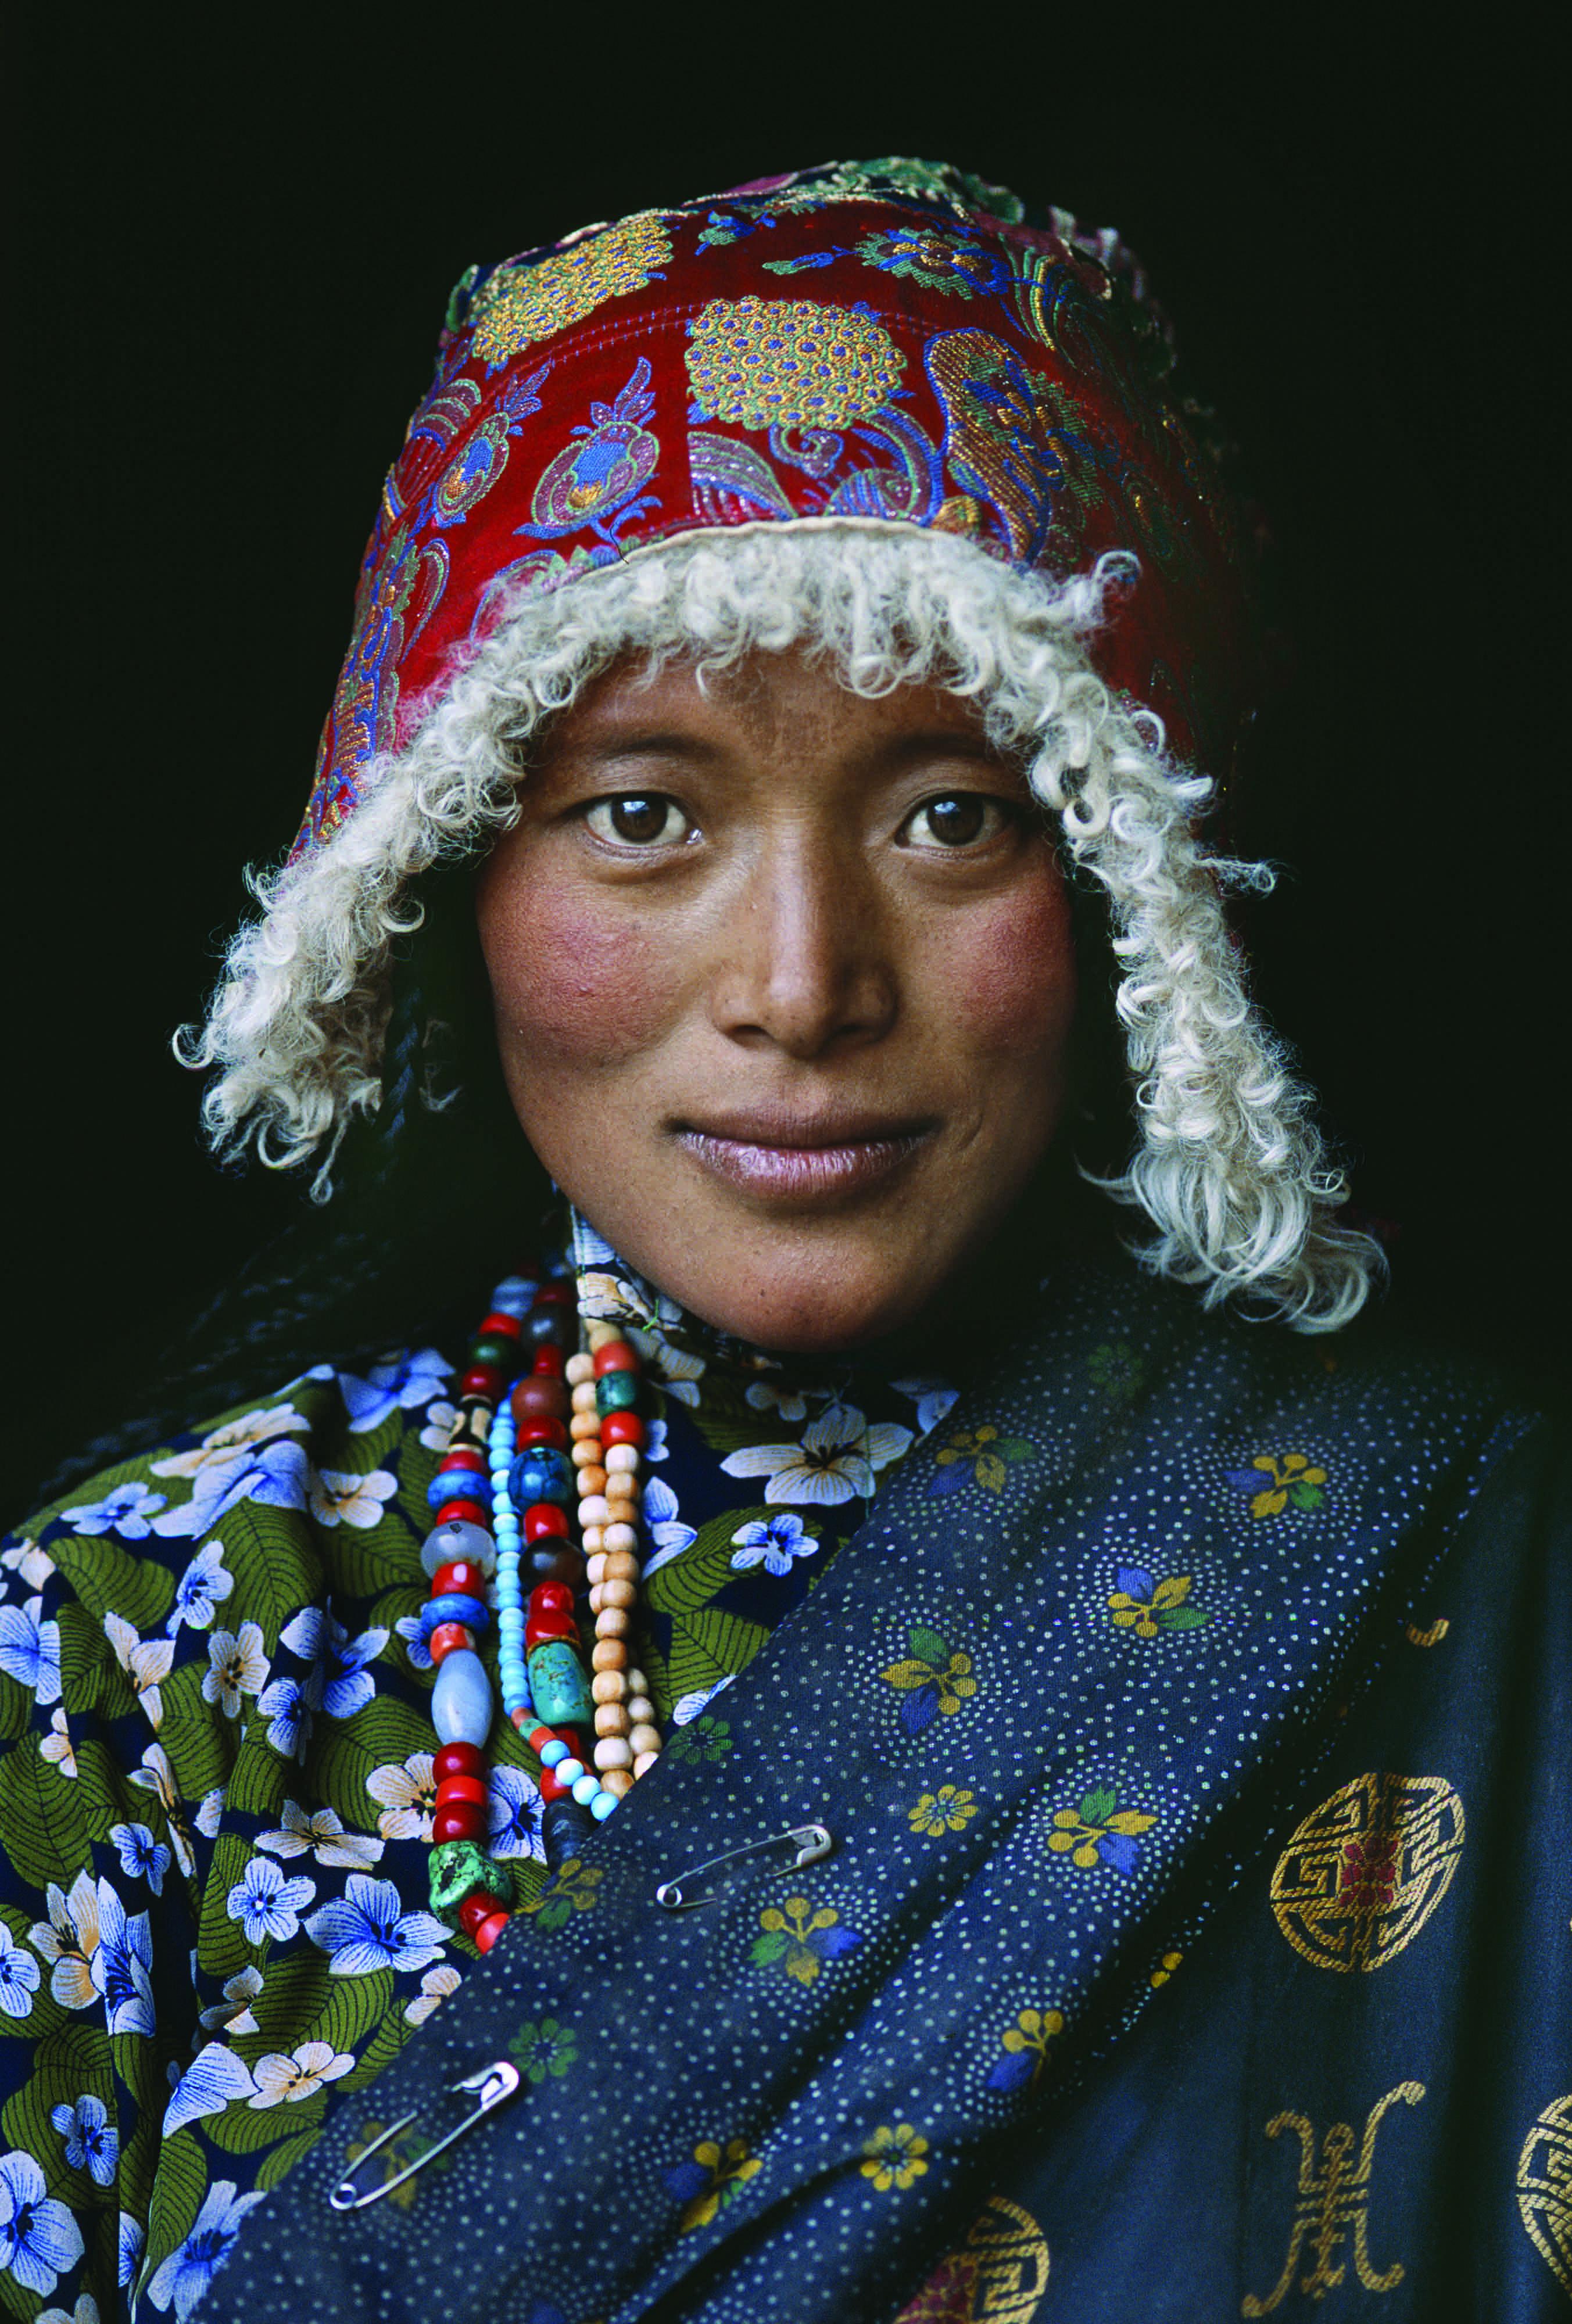 Pilgrim at a Stupa, Amdo, Tibet, 2001.